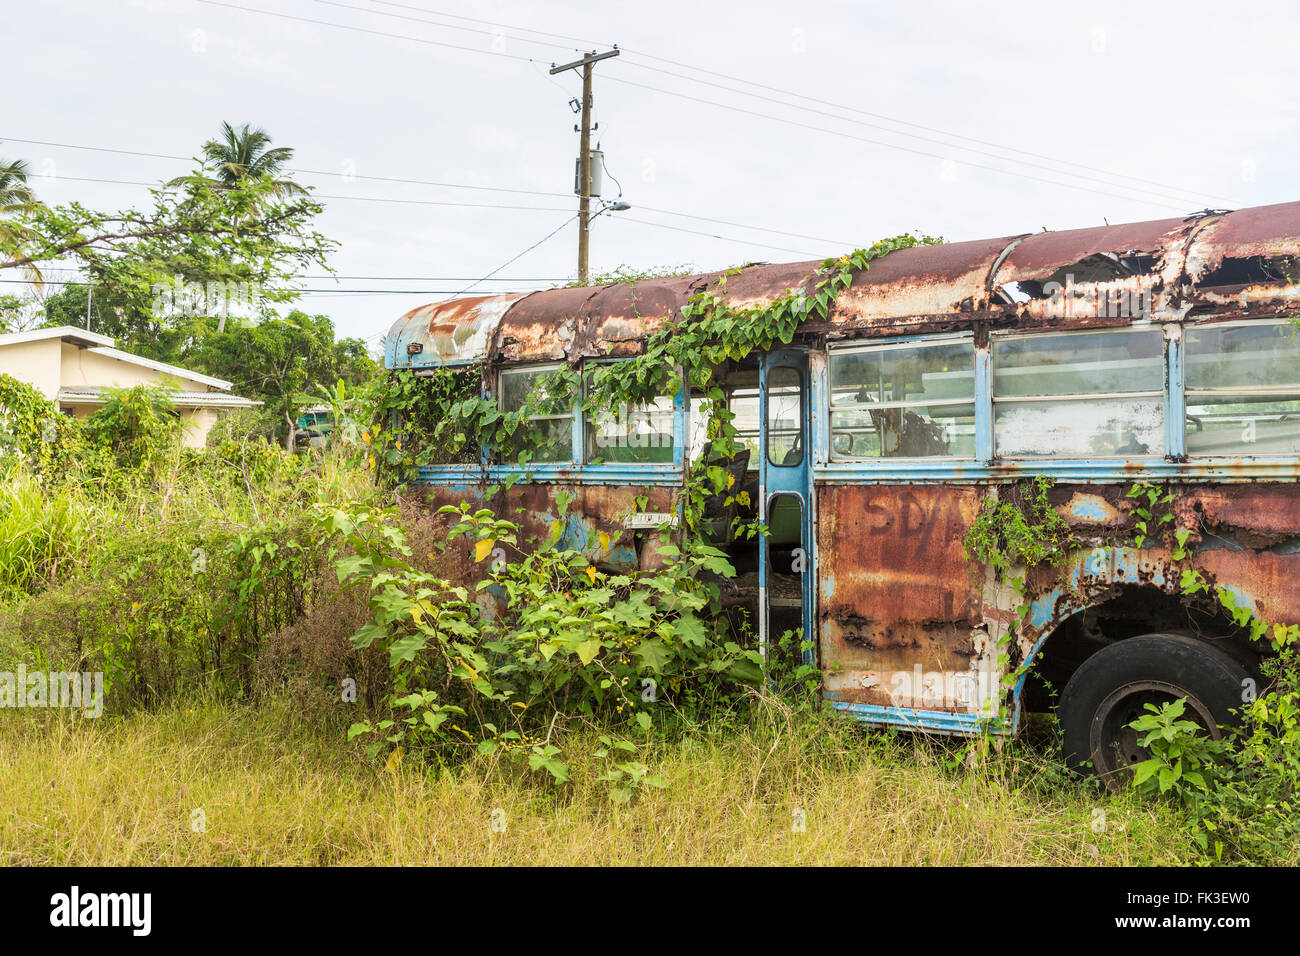 Overgrown Blue Bird coach in Ogg Spencer's Trucking scrapyard, Liberta, south Antigua, Antigua and Barbuda, - Stock Image